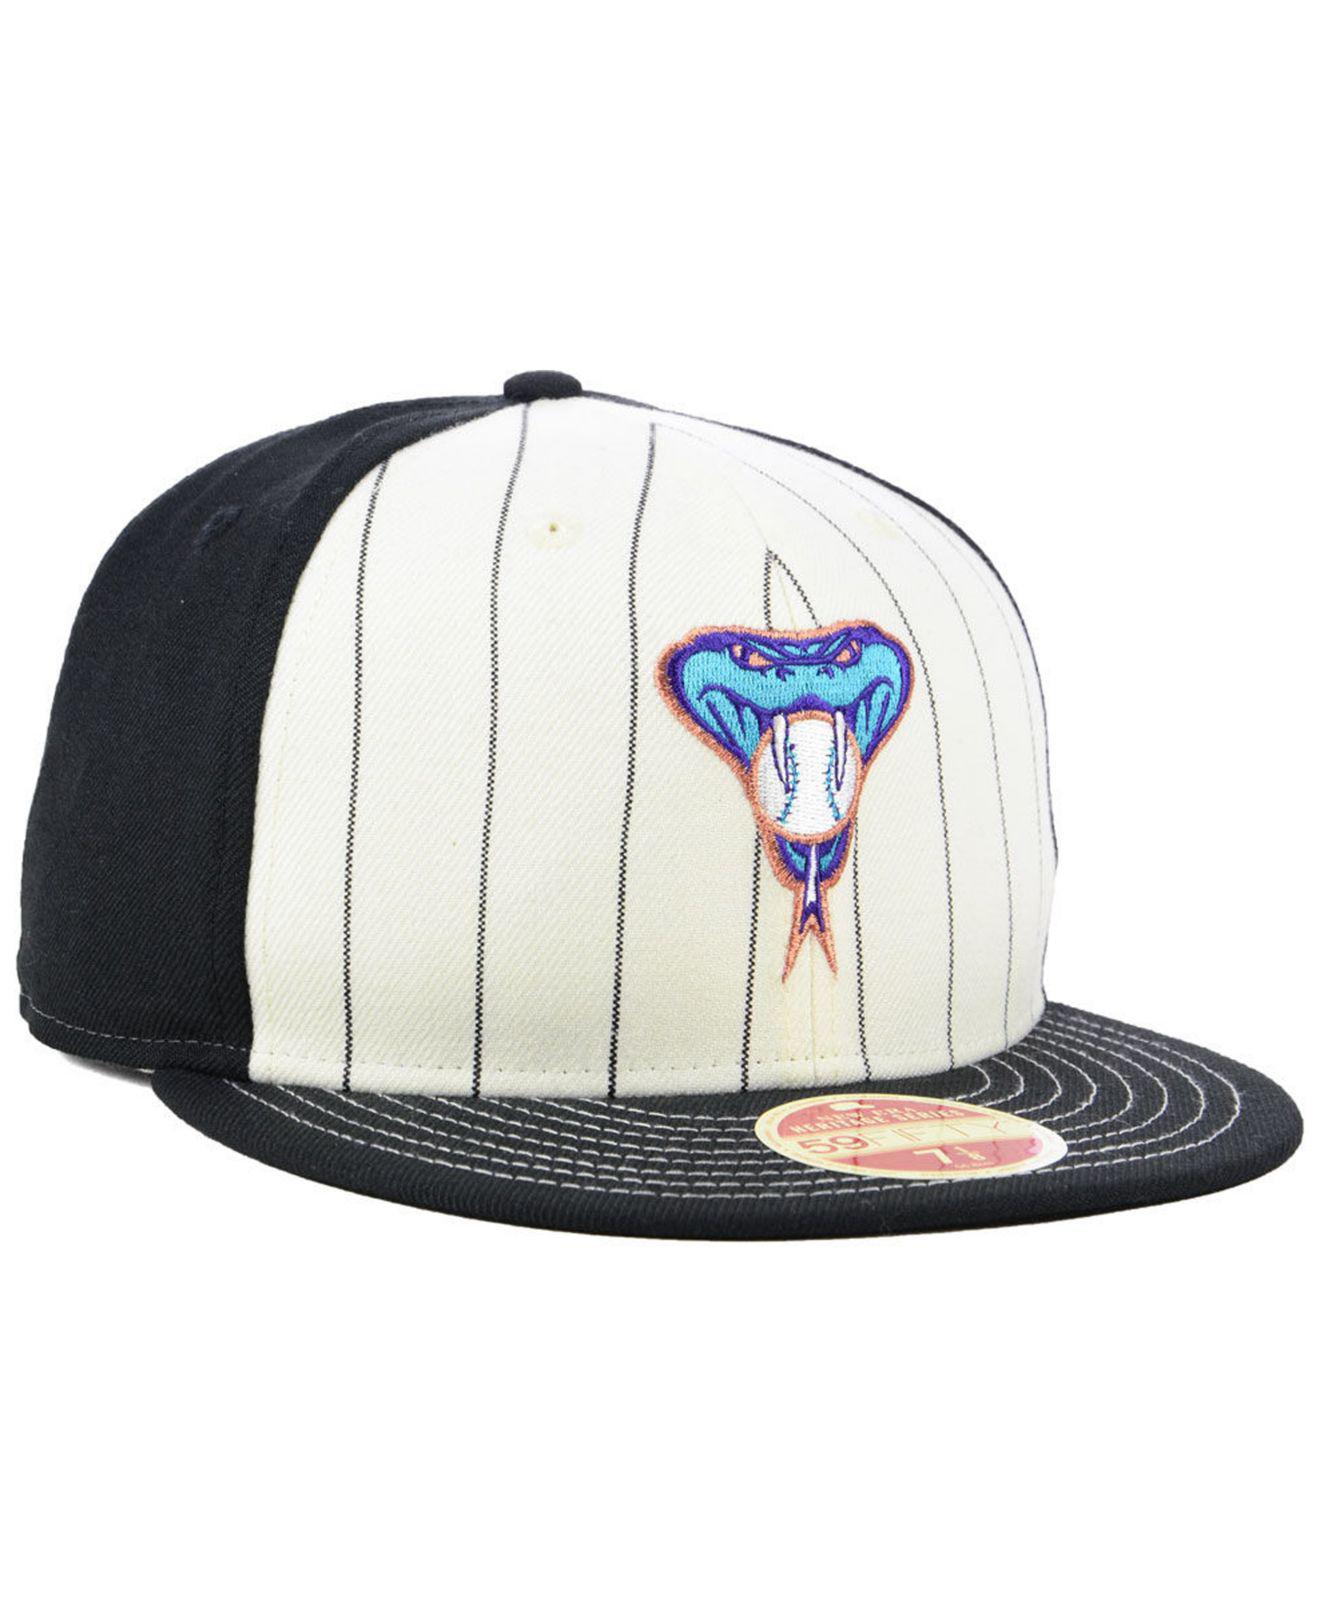 premium selection 7939c 8e090 ... cheap arizona diamondbacks vintage front 59fifty fitted cap for men lyst.  view fullscreen ee0c0 08494